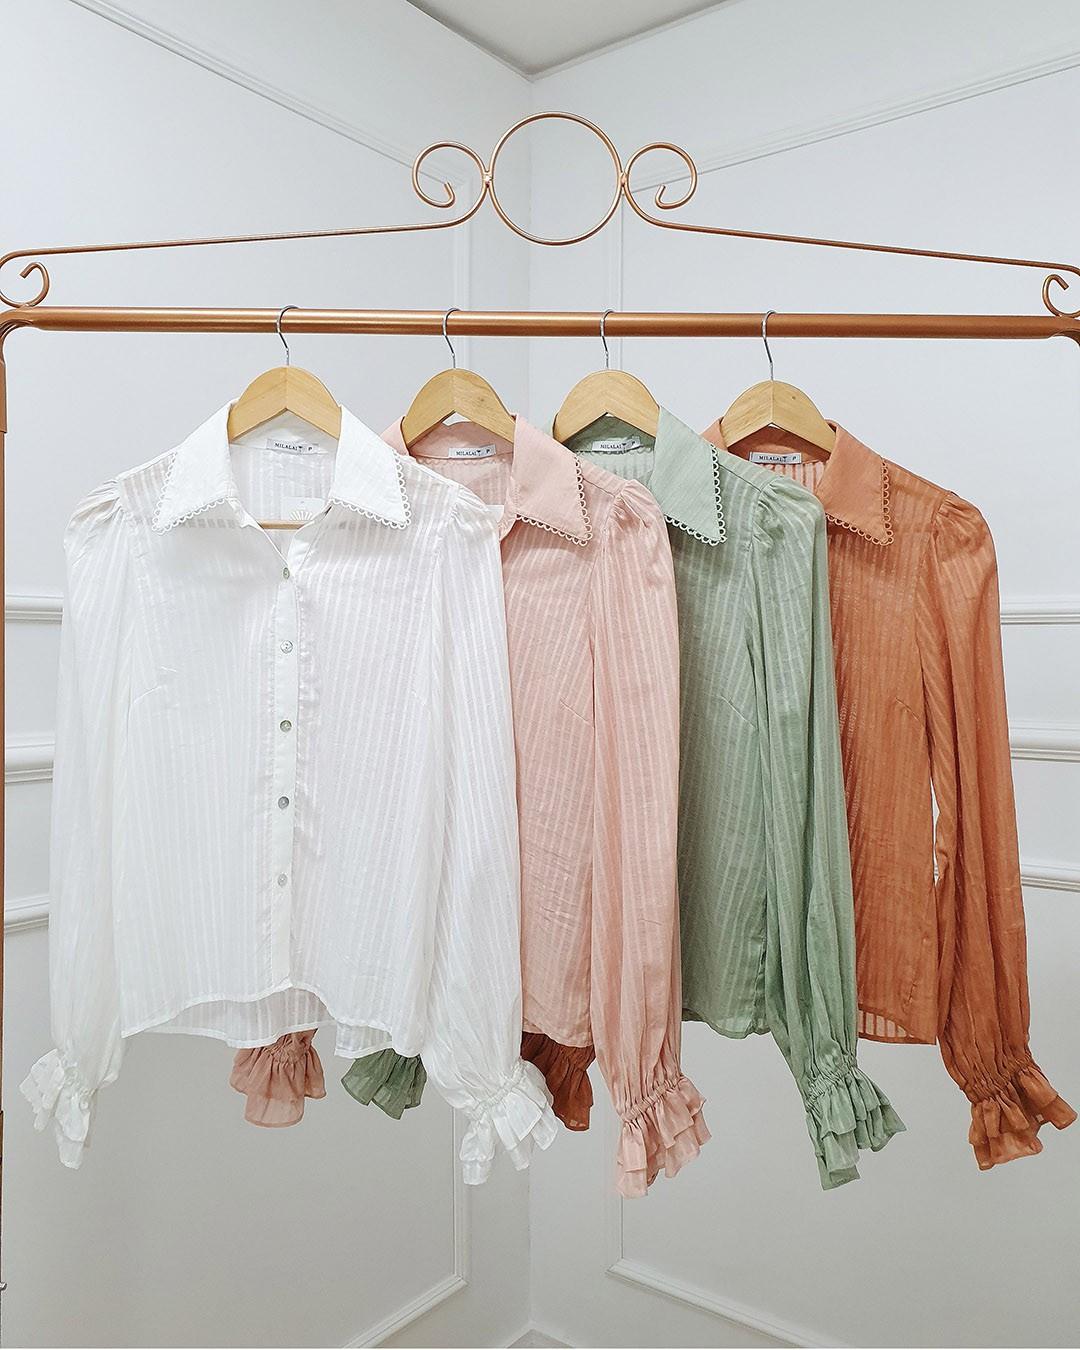 Camisa Social Feminina com Listras e Guipir Milalai